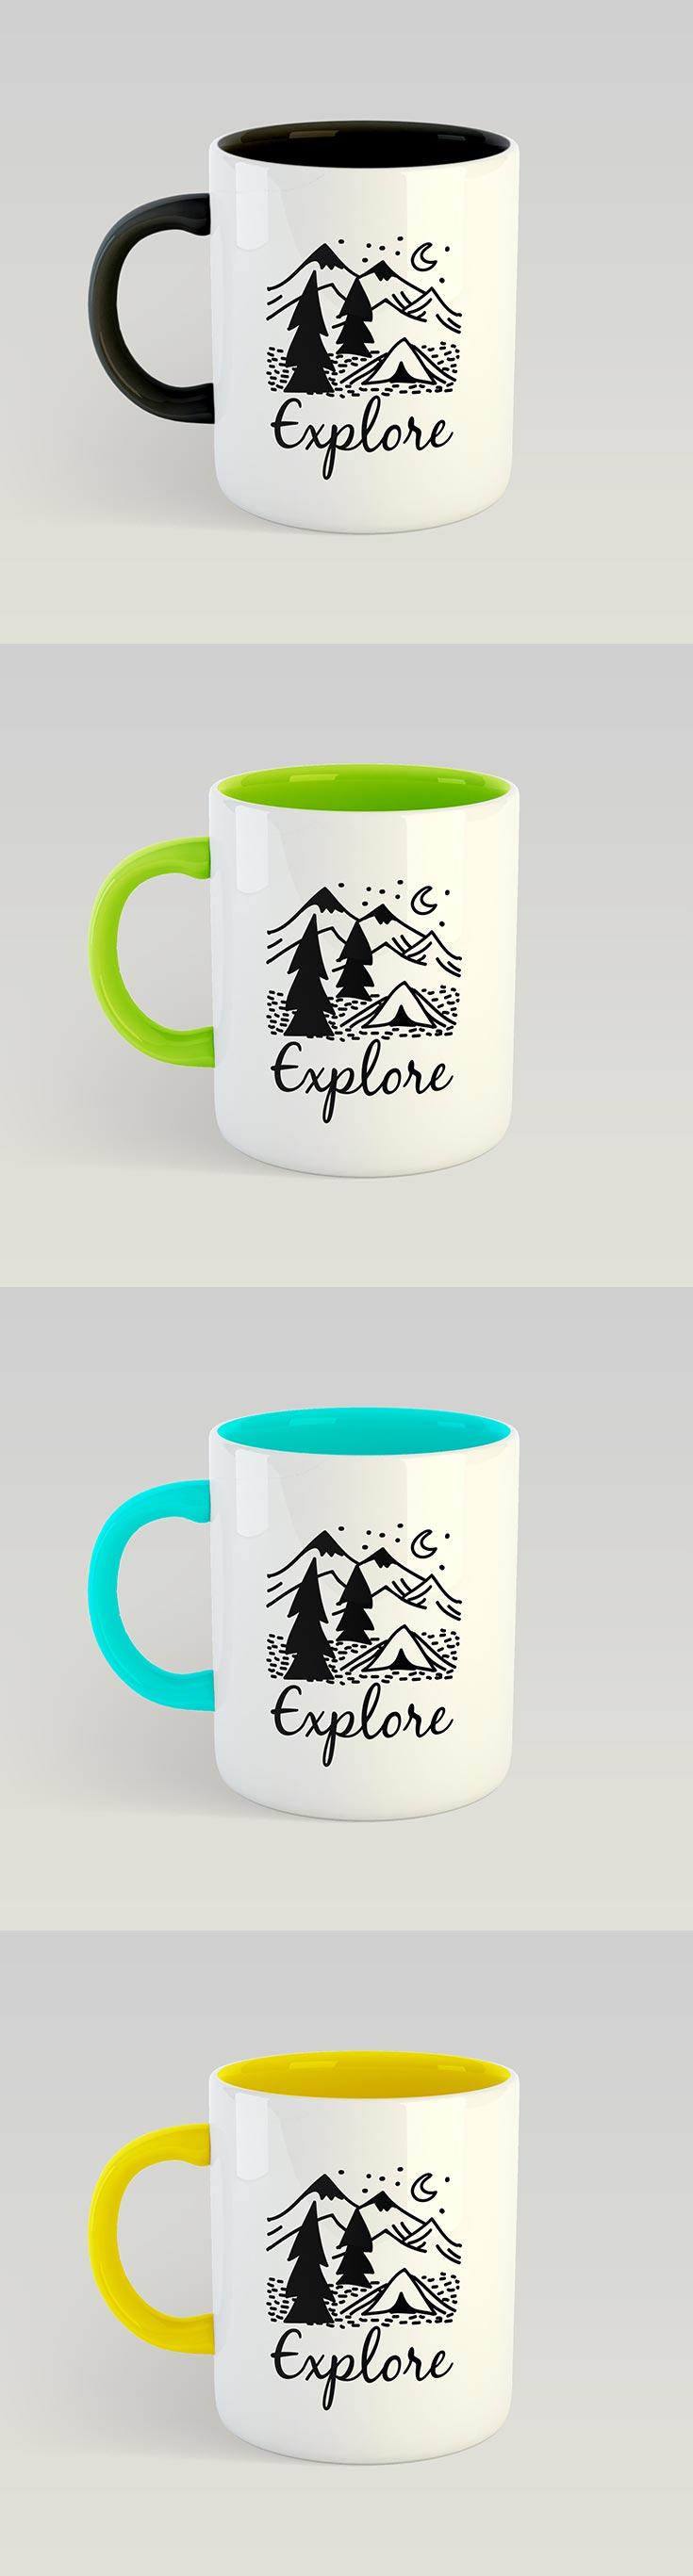 Free Dual Tone Coffee Mug Mockup